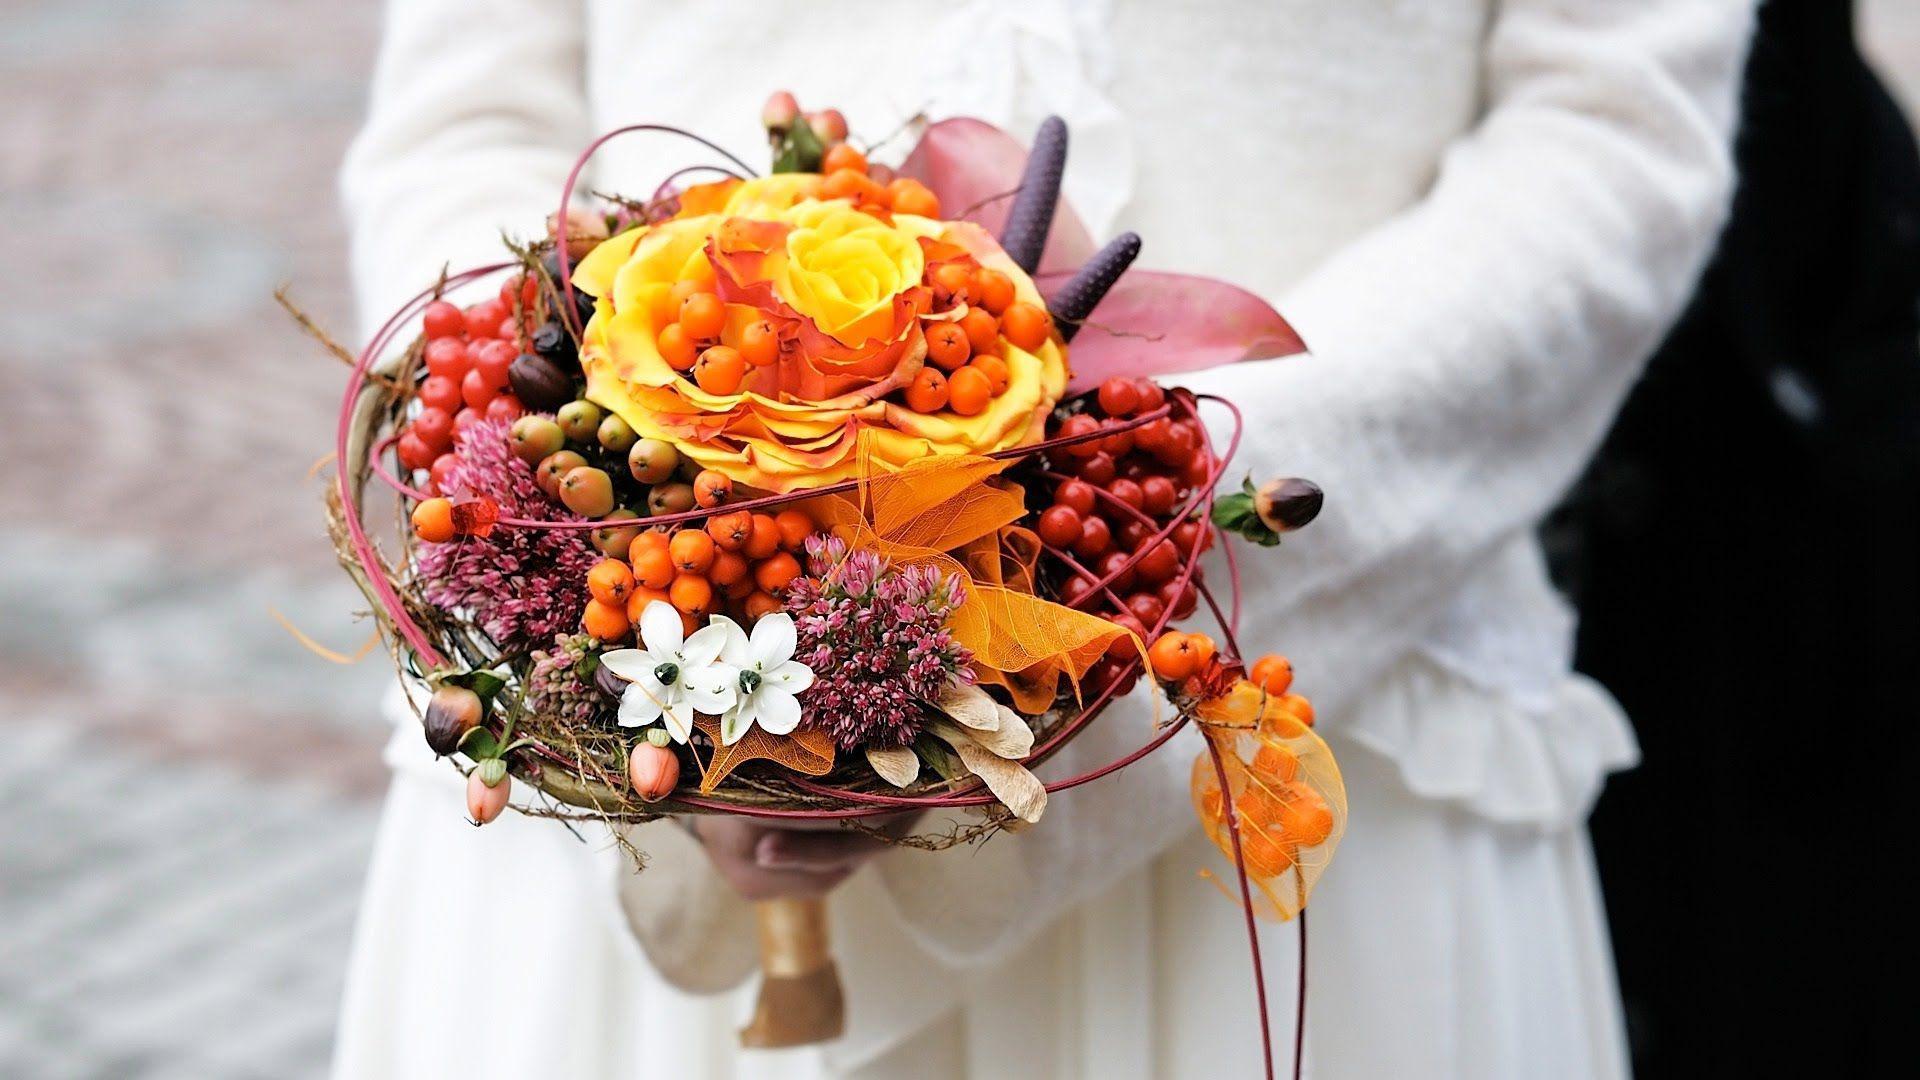 buchet cu flori de toamna